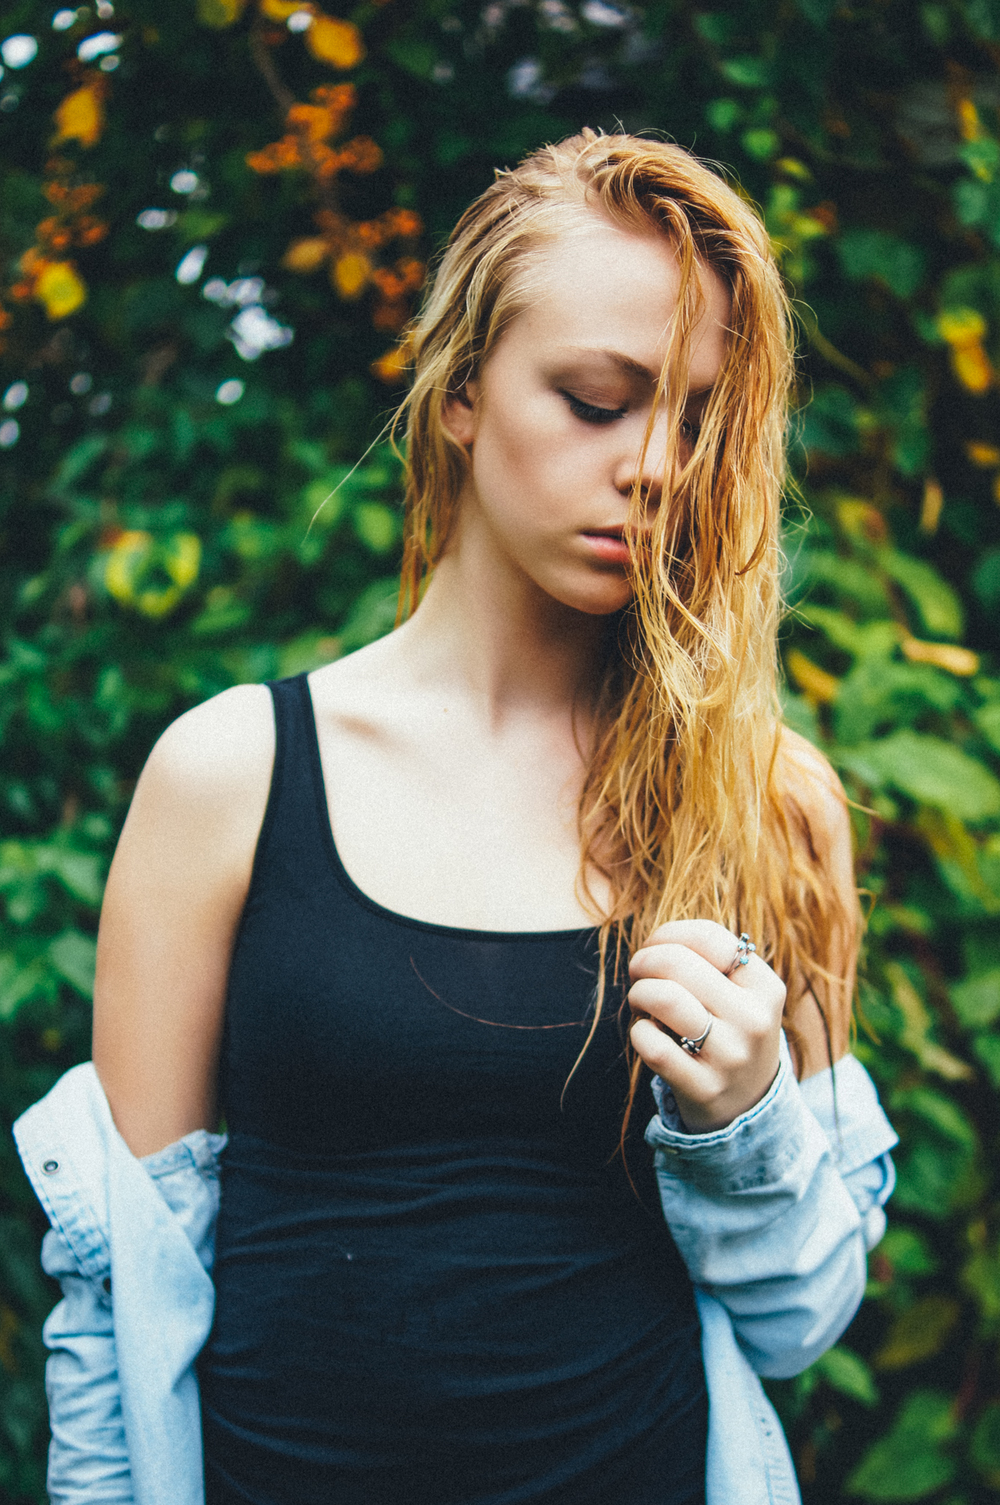 Leah | Model Club